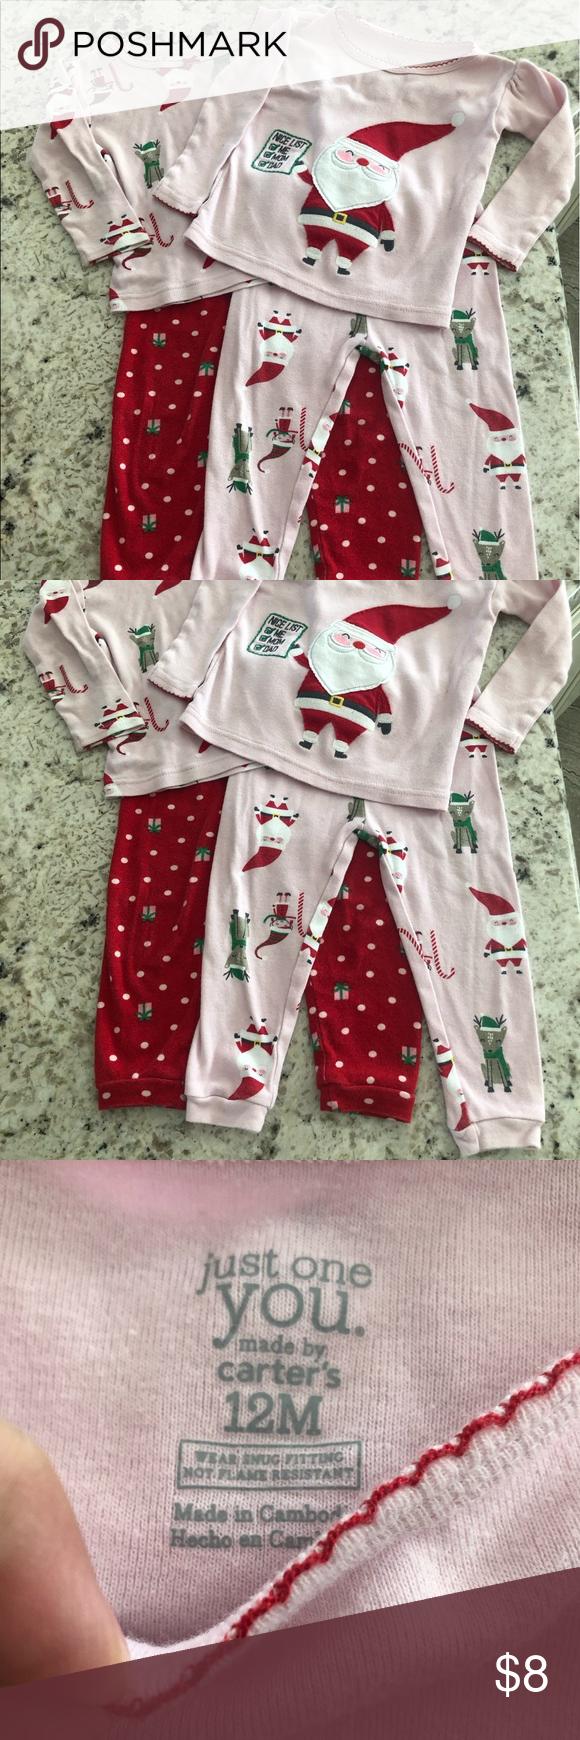 Christmas Pajama set in 2020 Christmas pajama set